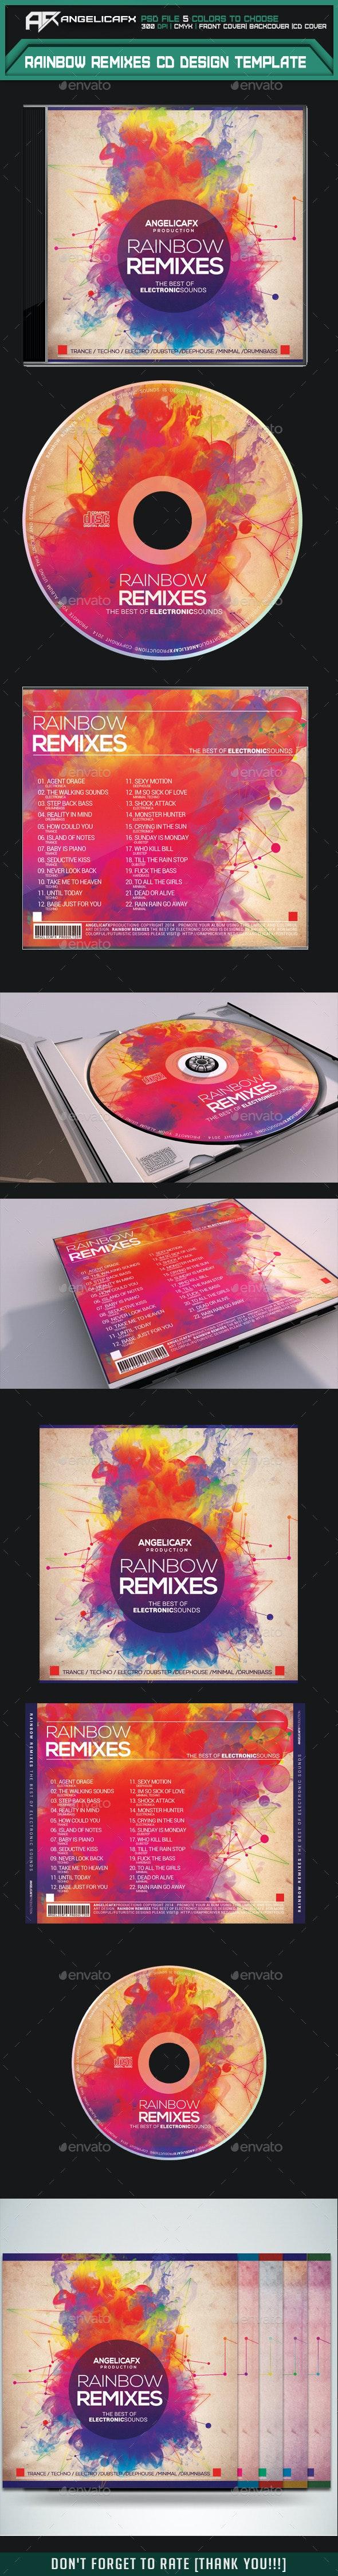 Rainbow Remixes CD Design Template - CD & DVD Artwork Print Templates